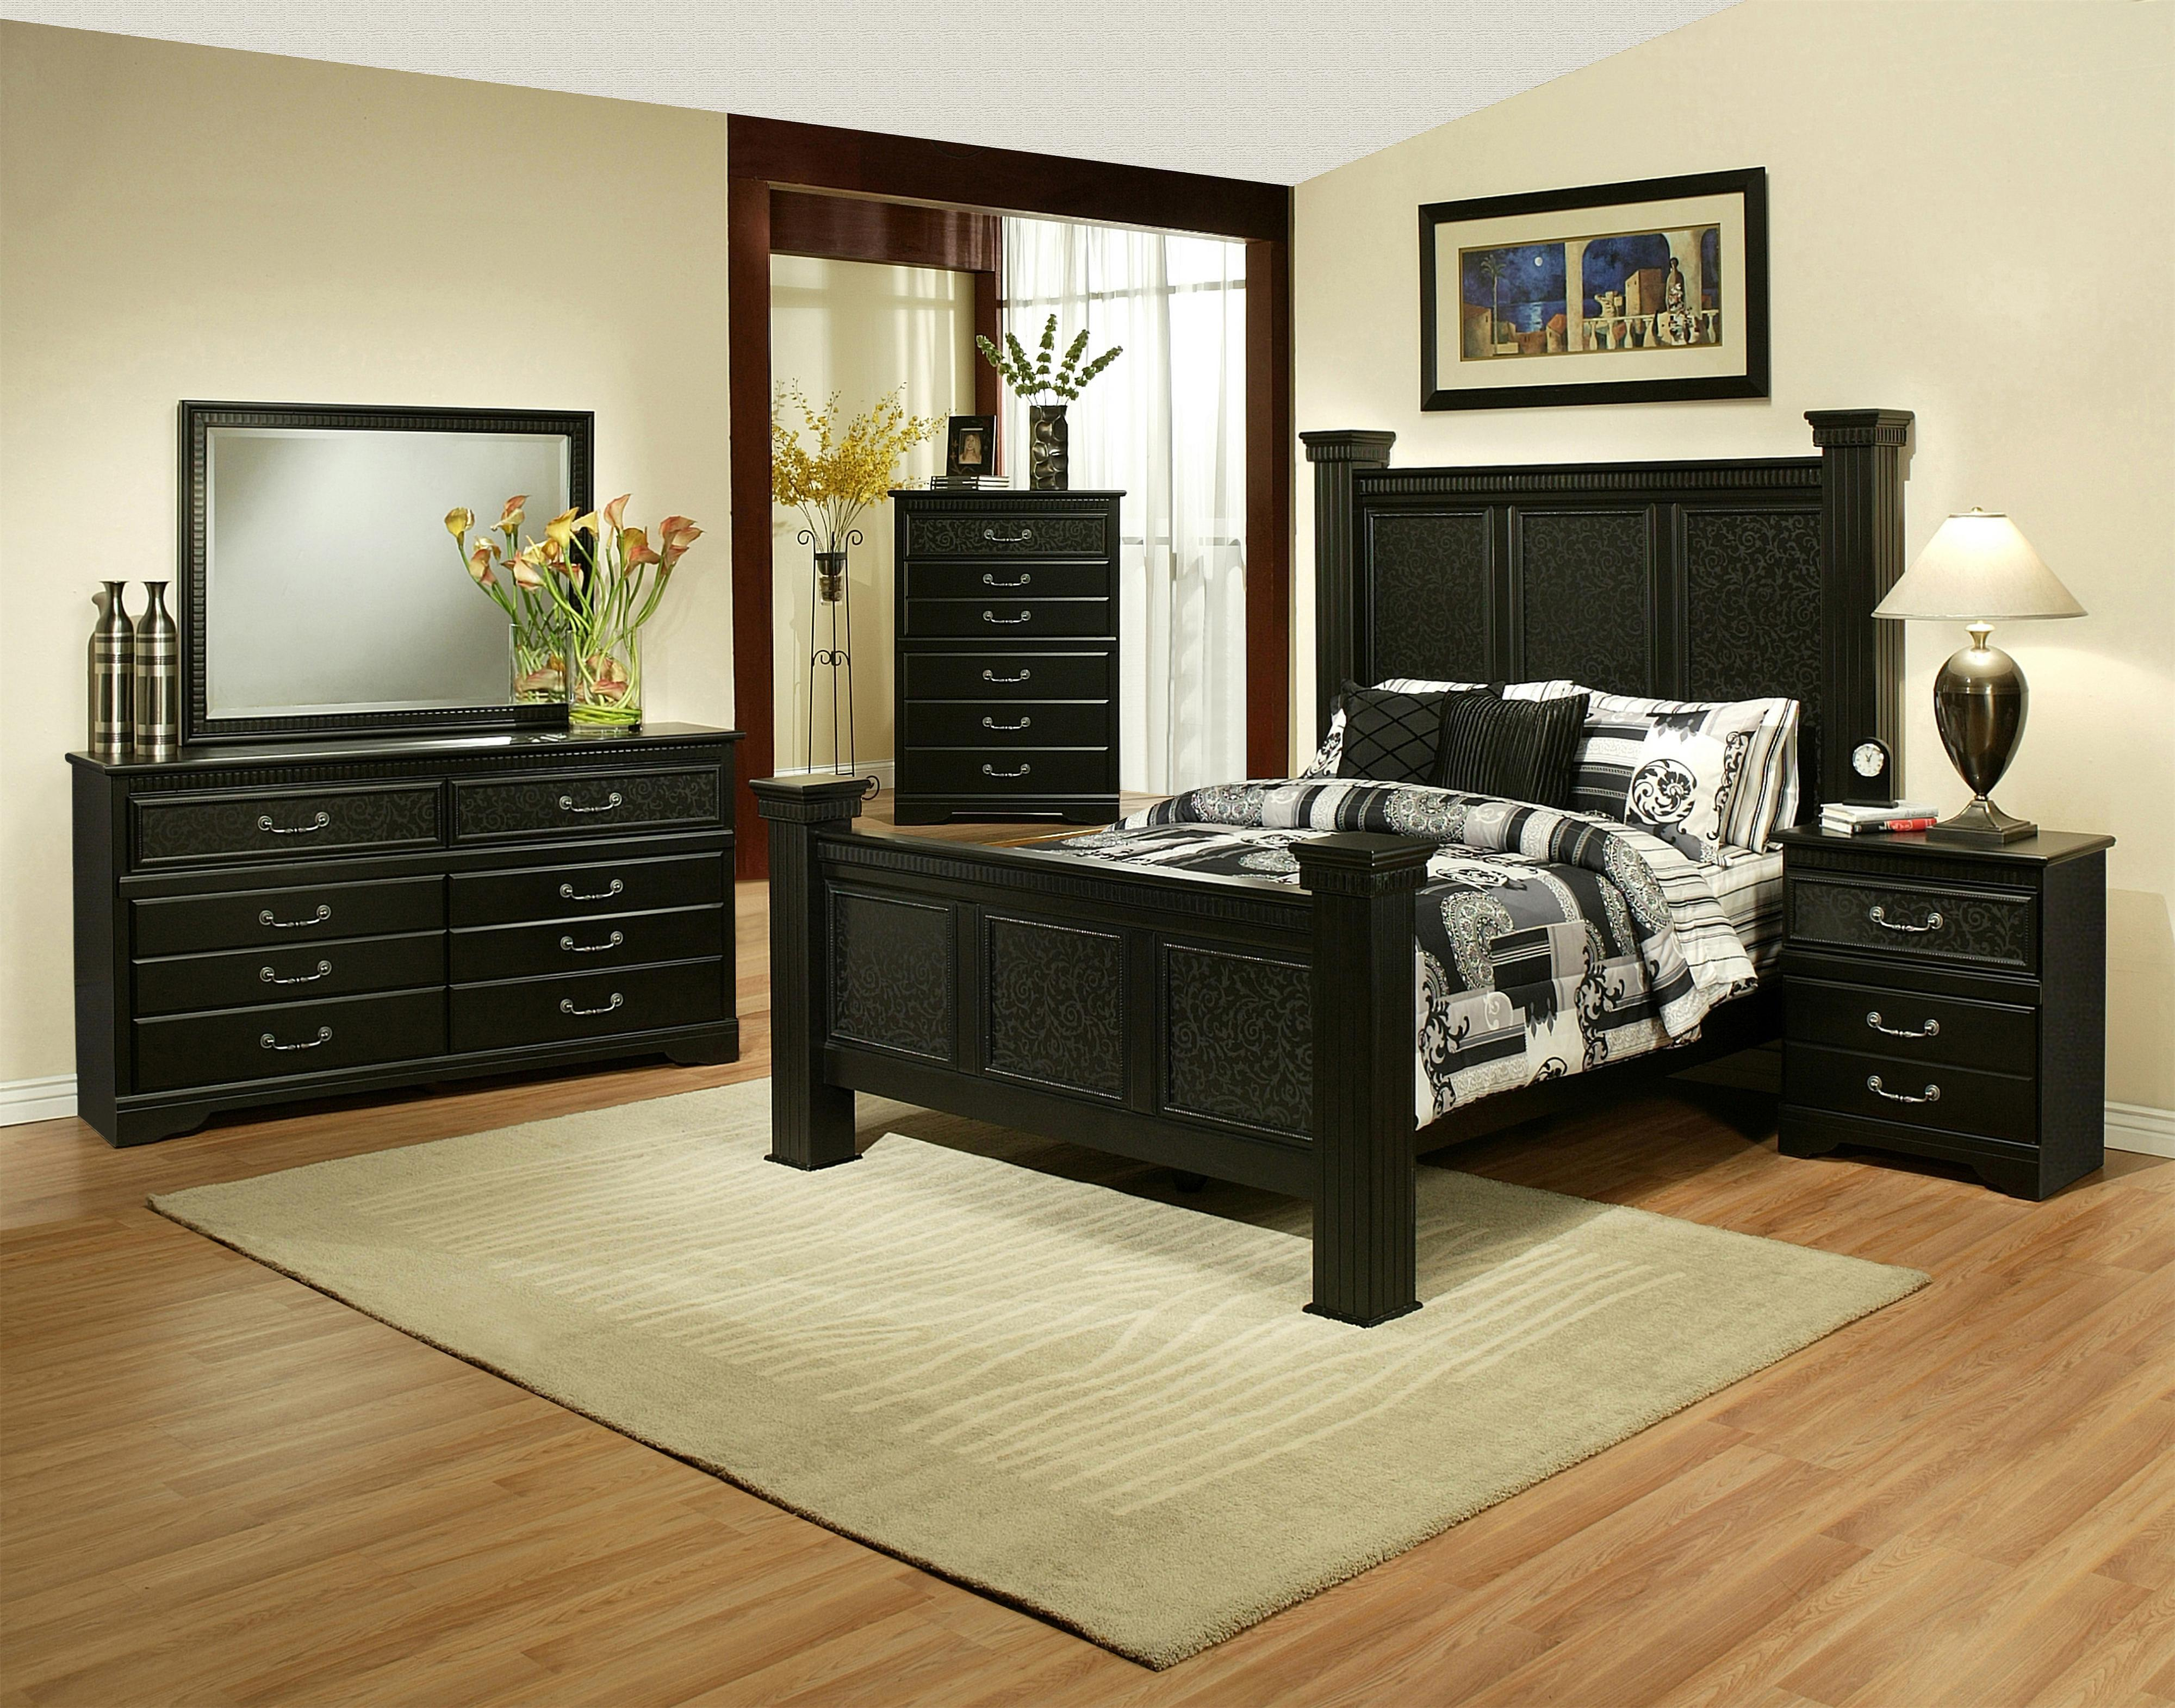 Sandberg Furniture Granada  Granada King-Set 2 - Item Number: KING-G2